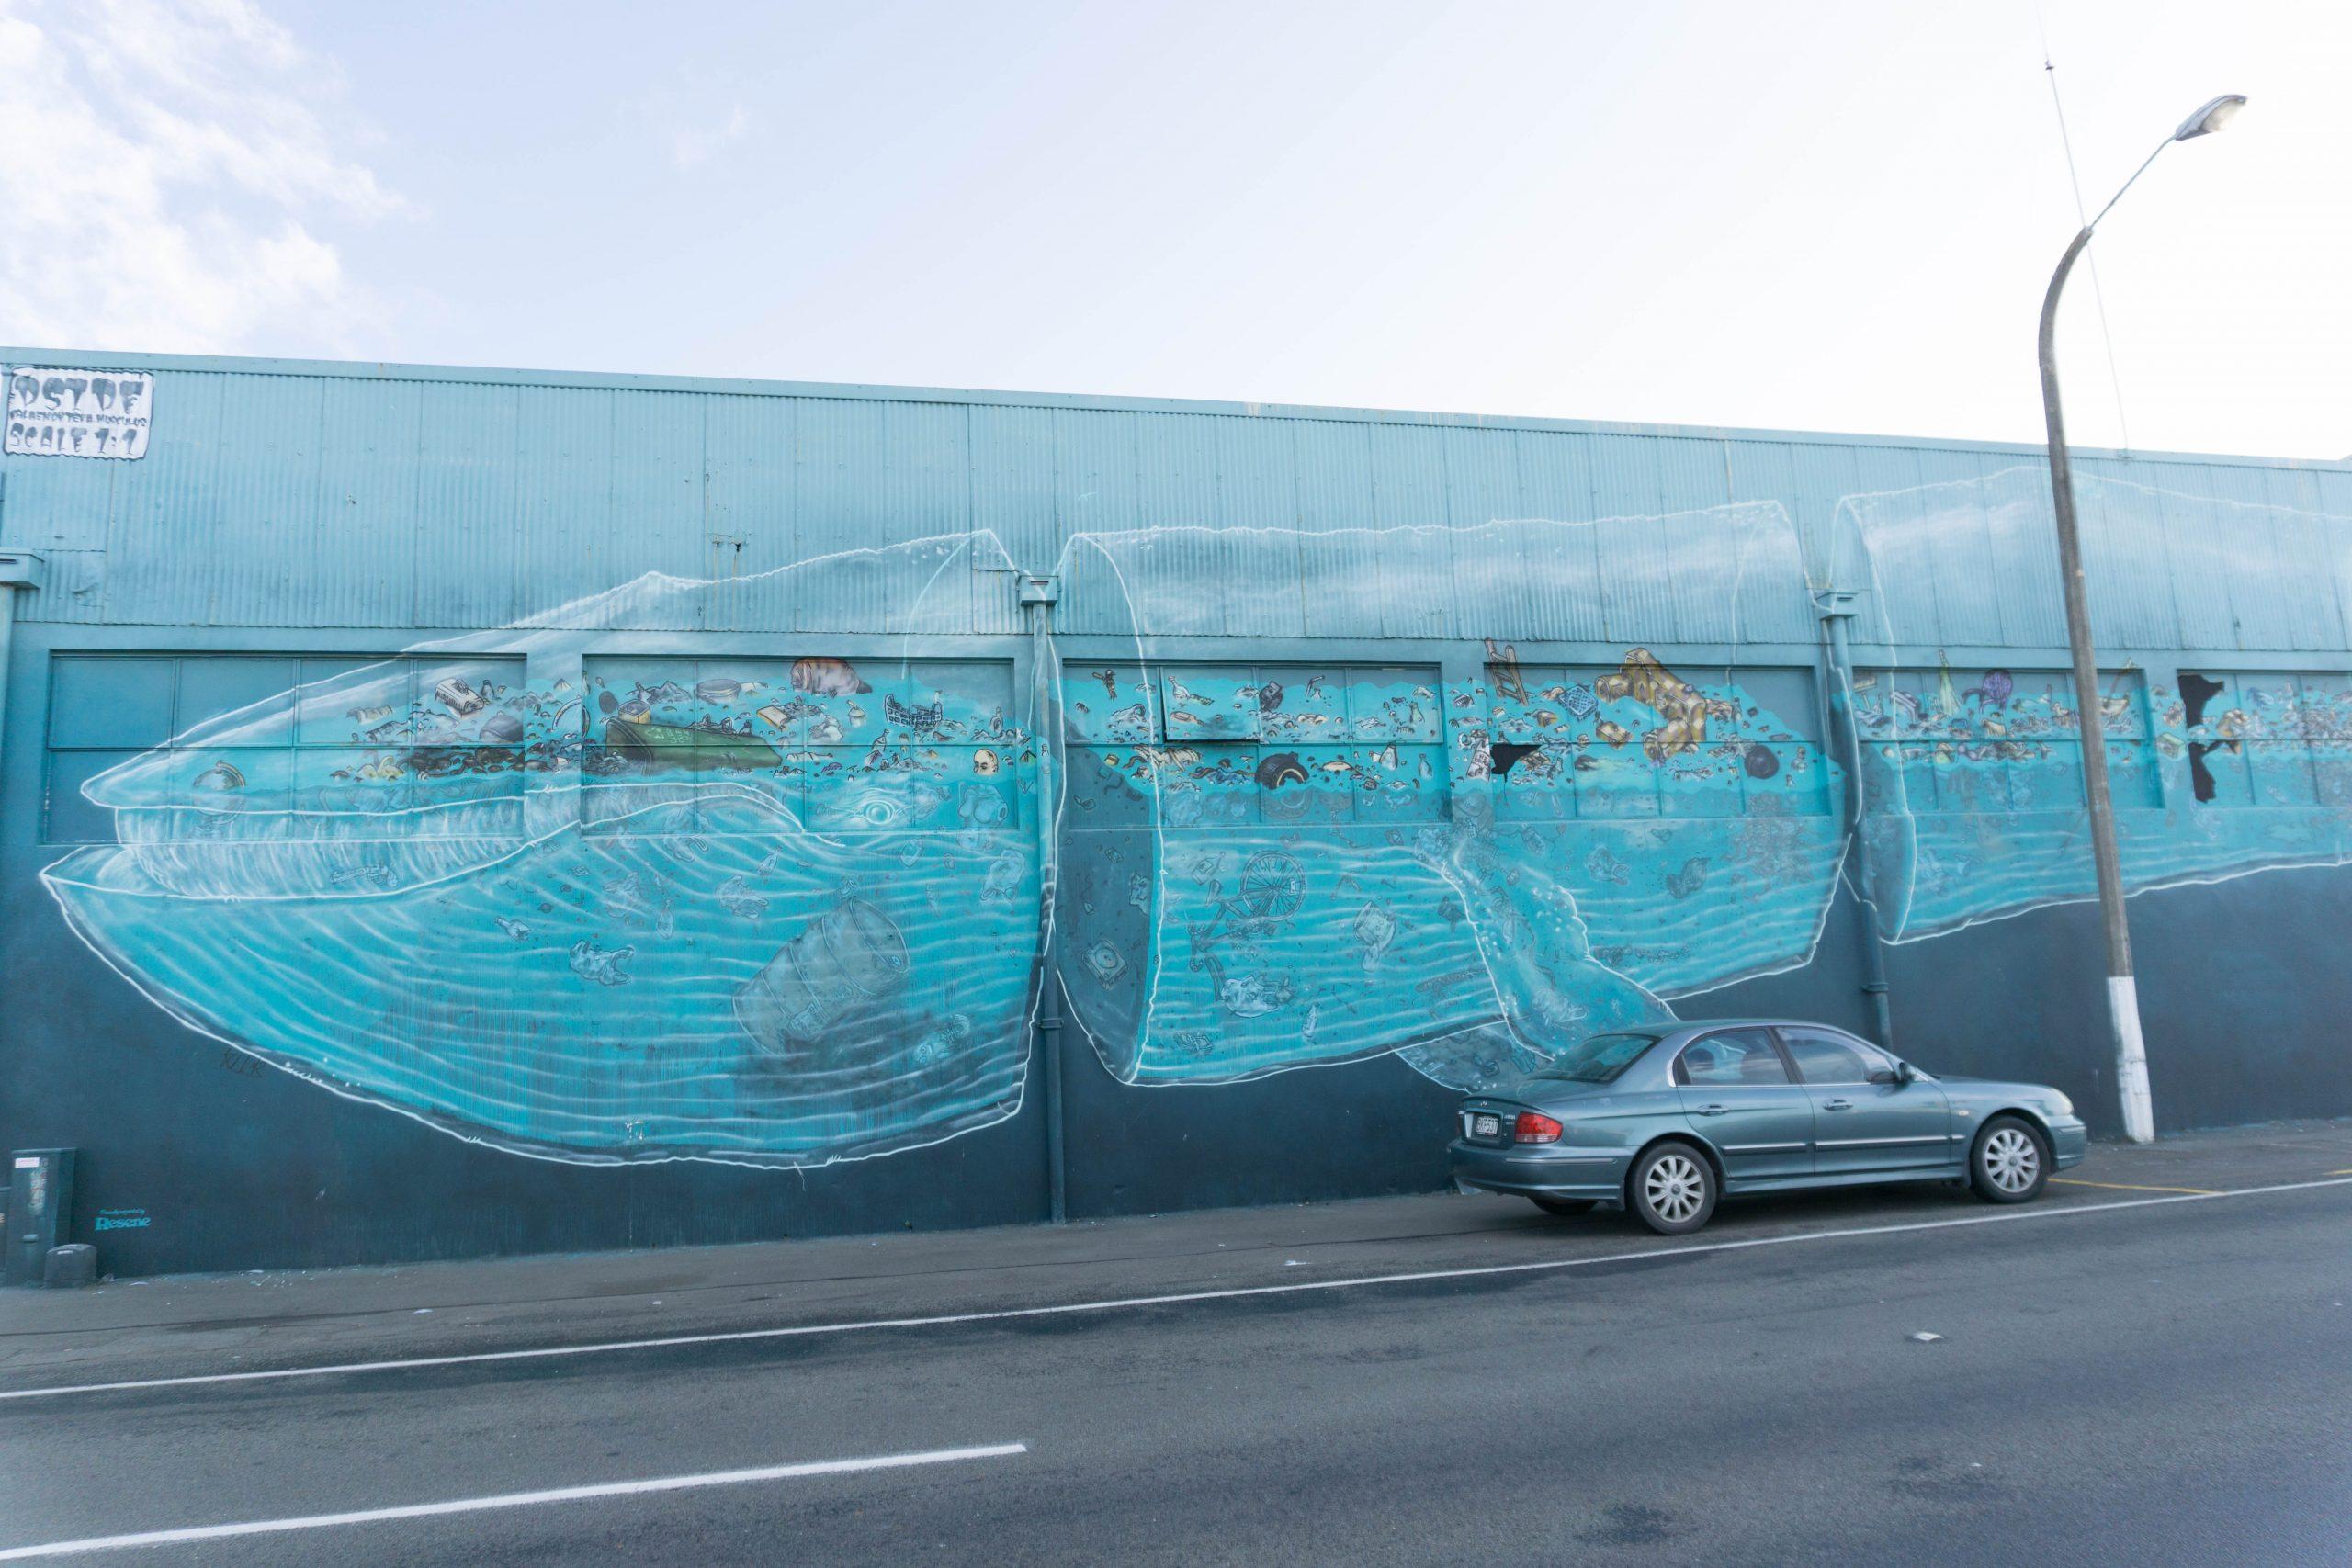 Pangeaseed Sea Wall whale in Napier